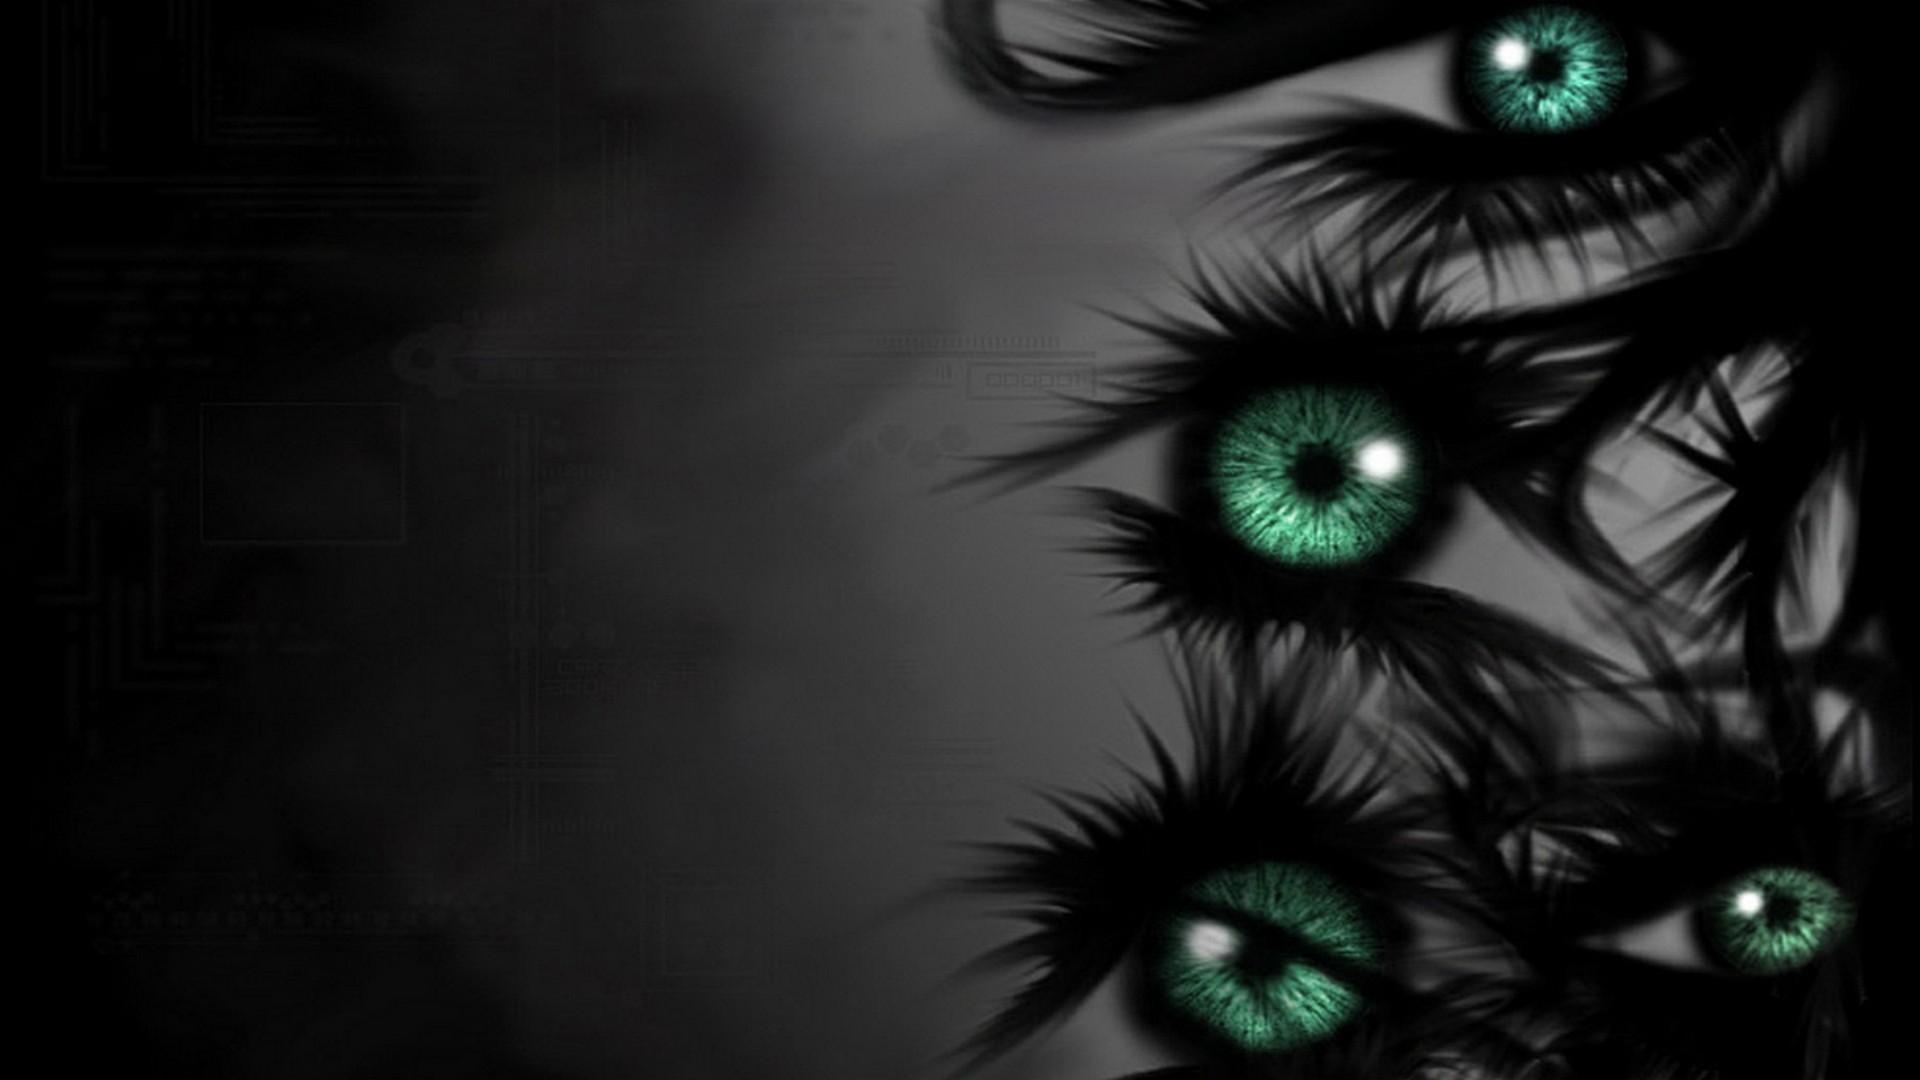 Abstract eyes dark darkness wallpaper | | 209945 | WallpaperUP